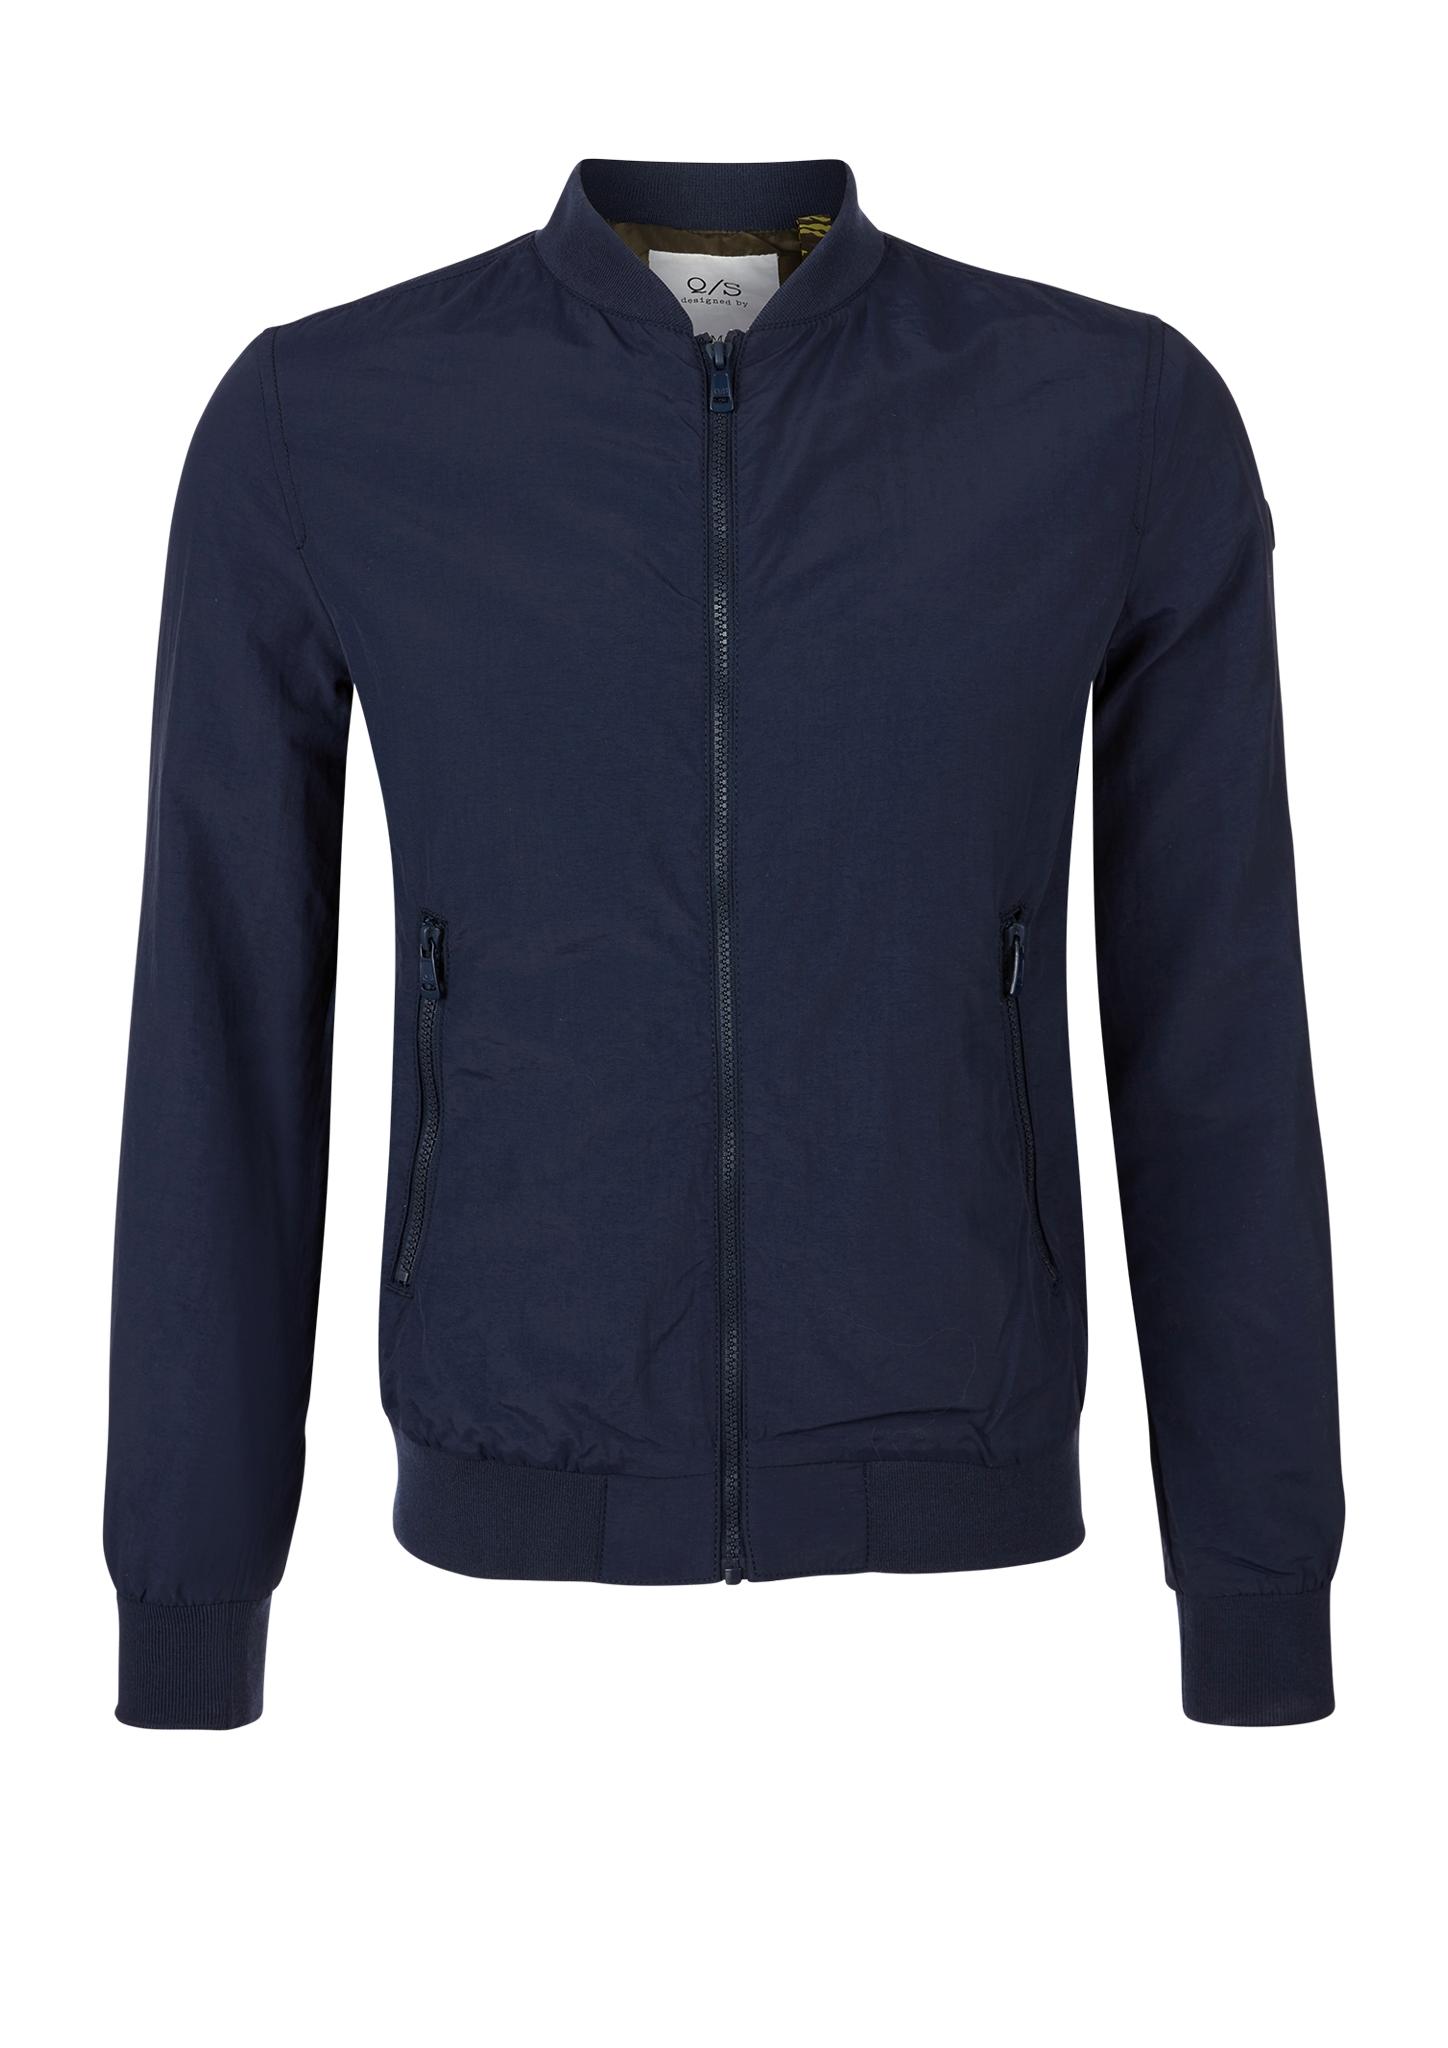 Blousonjacke | Bekleidung > Jacken > Blousons | Blau | Obermaterial 100% polyamid| futter 100% polyester | Q/S designed by